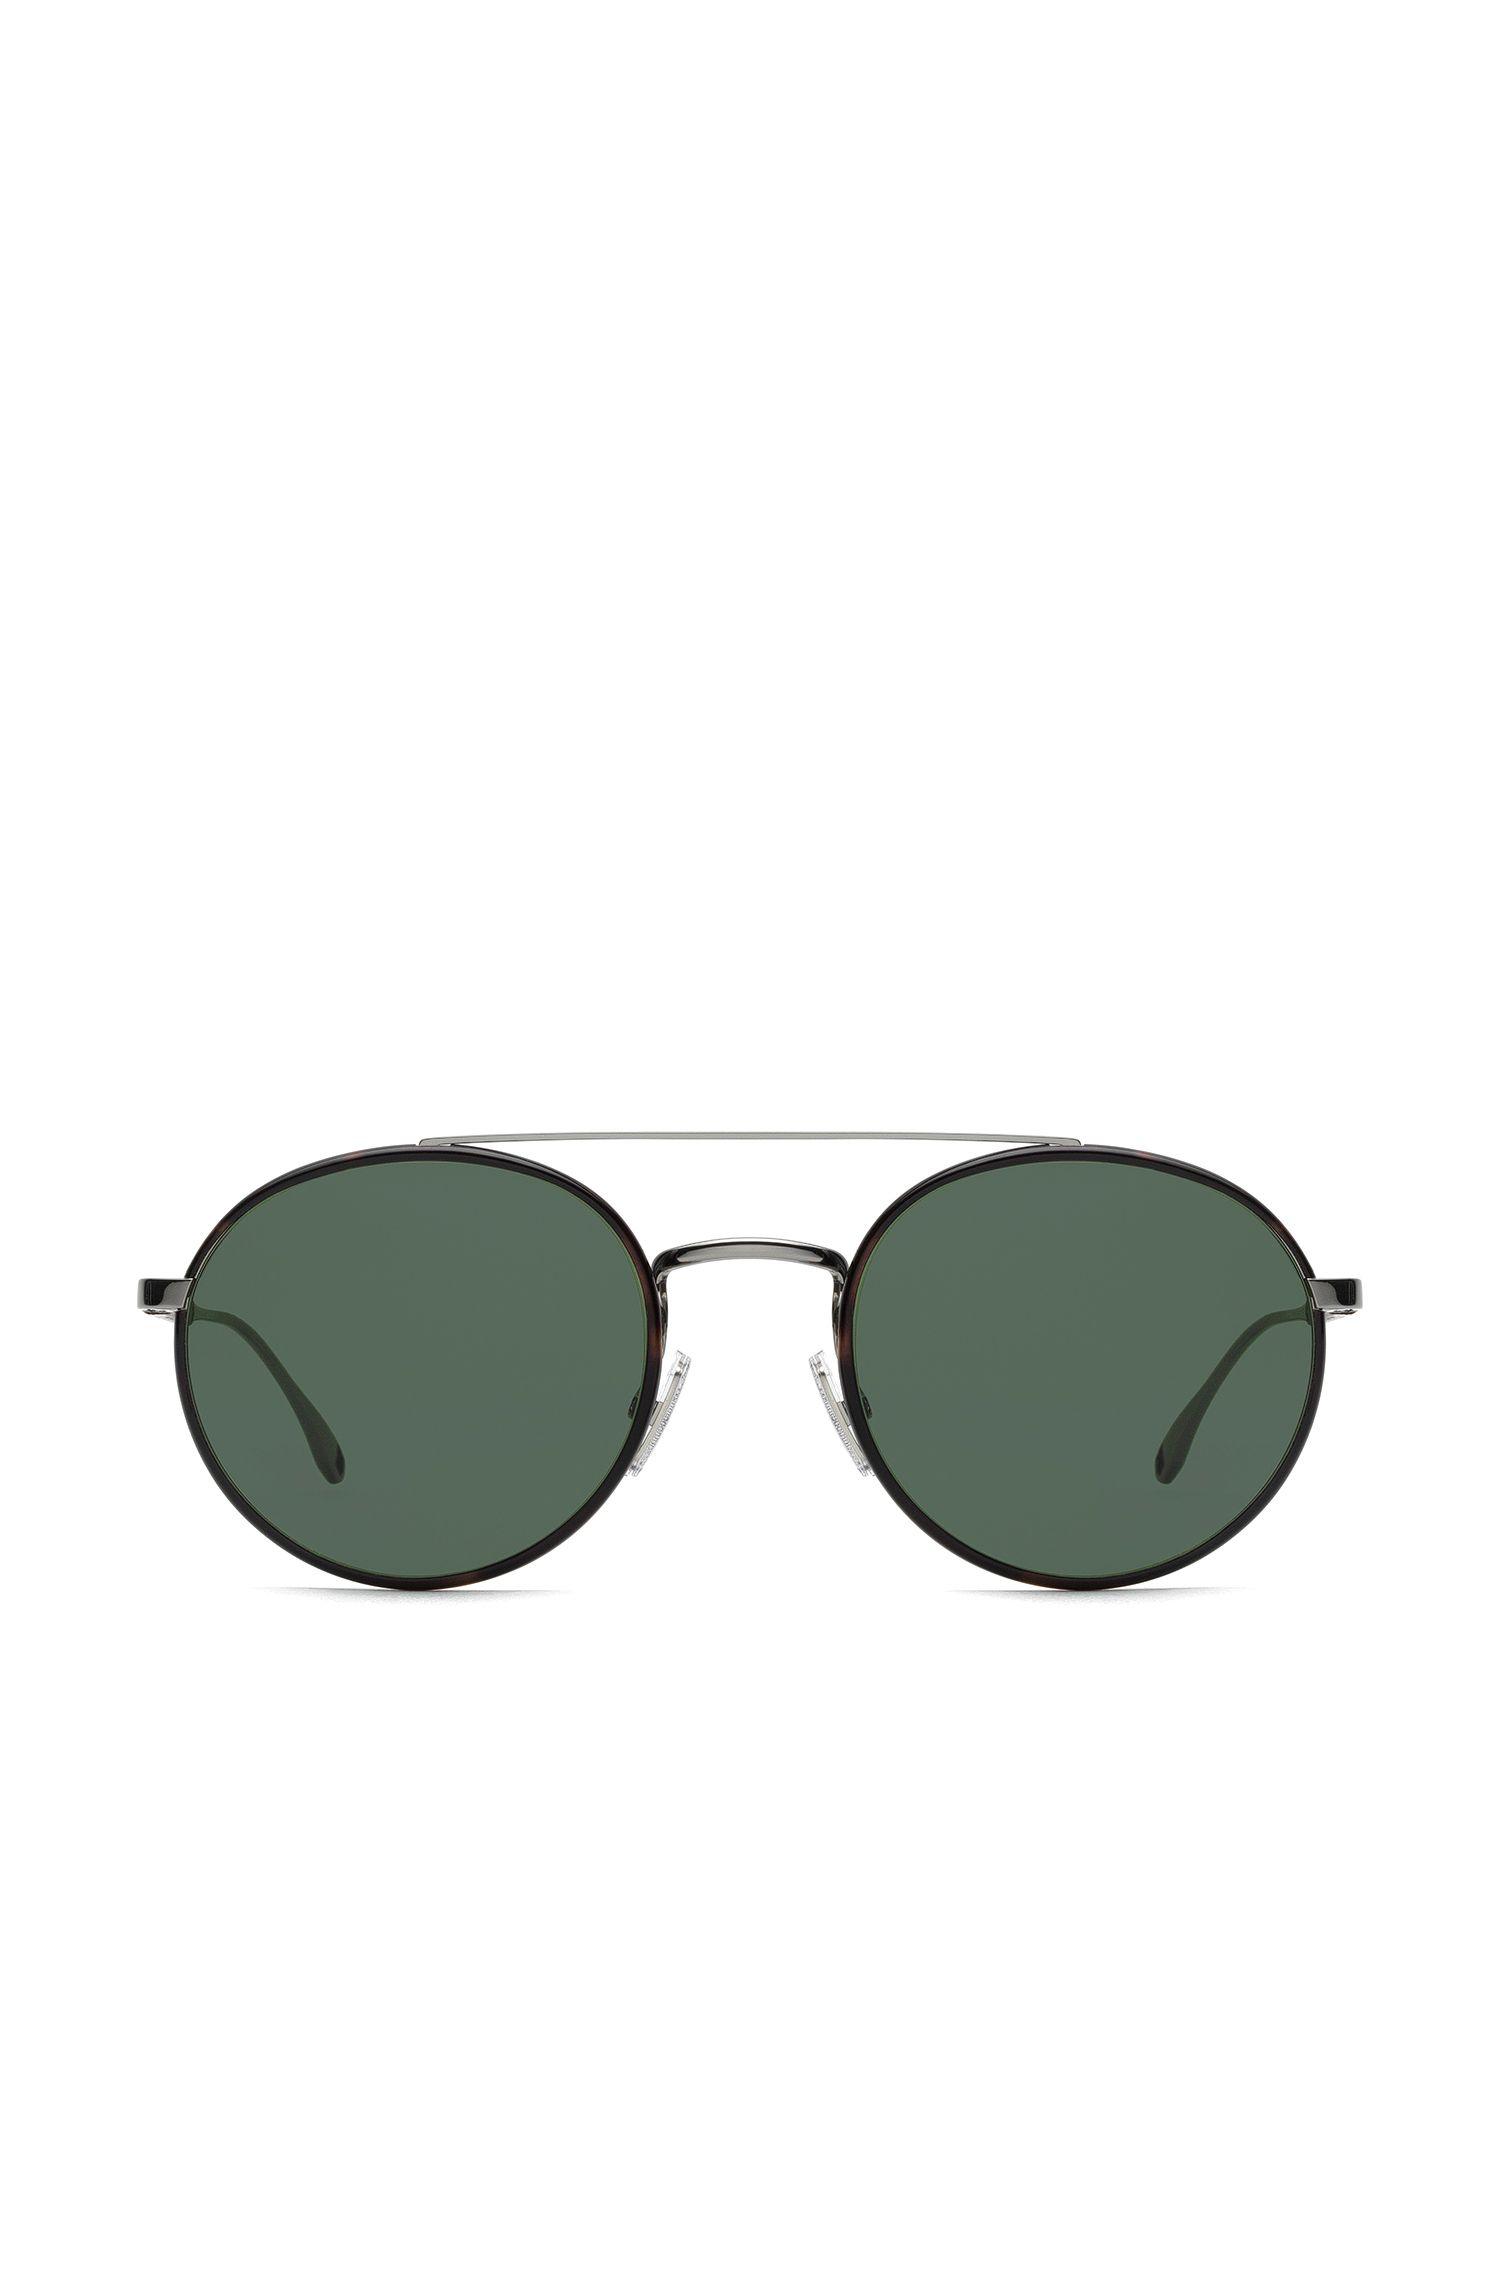 Double-bridge panto sunglasses with leather trim, Brown